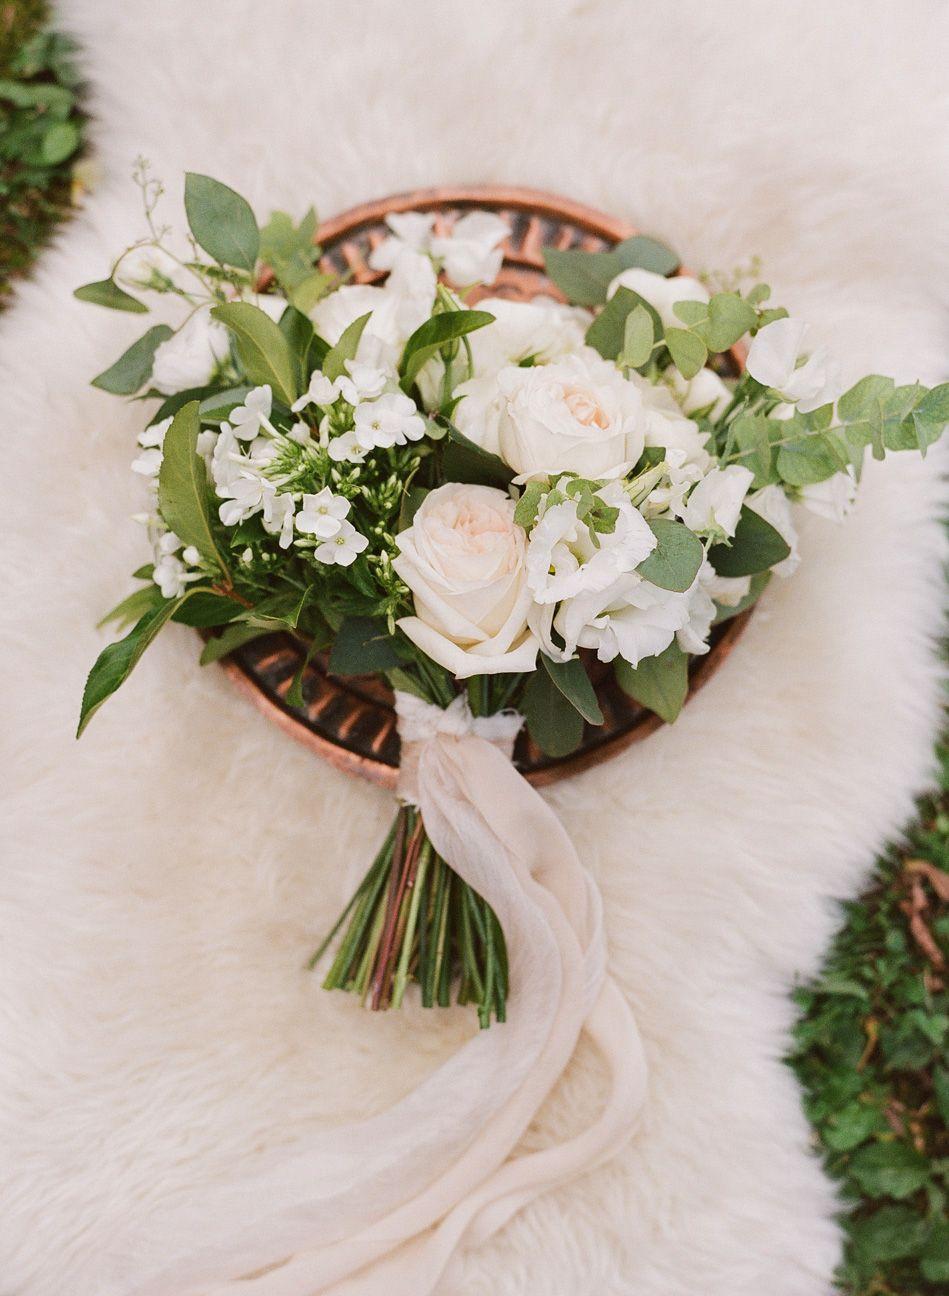 KarenHillPhotography-Parizat-Wedding-0045.jpg